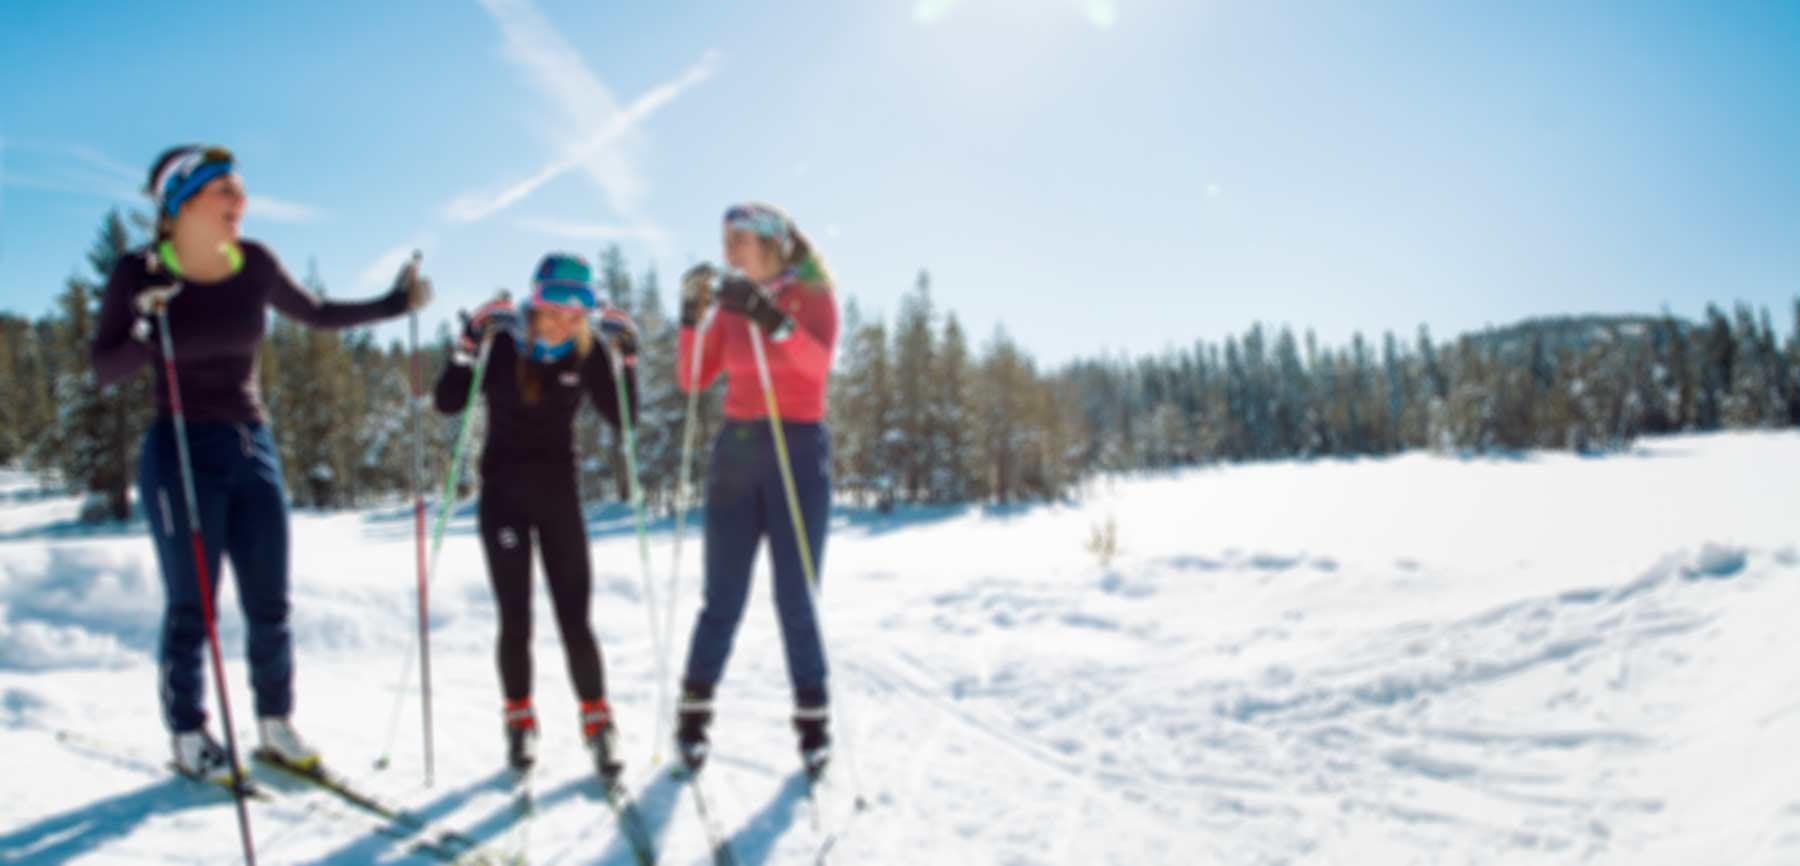 Cross Country Ski Sale Akers Ski Com >> Royal Gorge Cross Country Resort North America S Largest Xc Ski